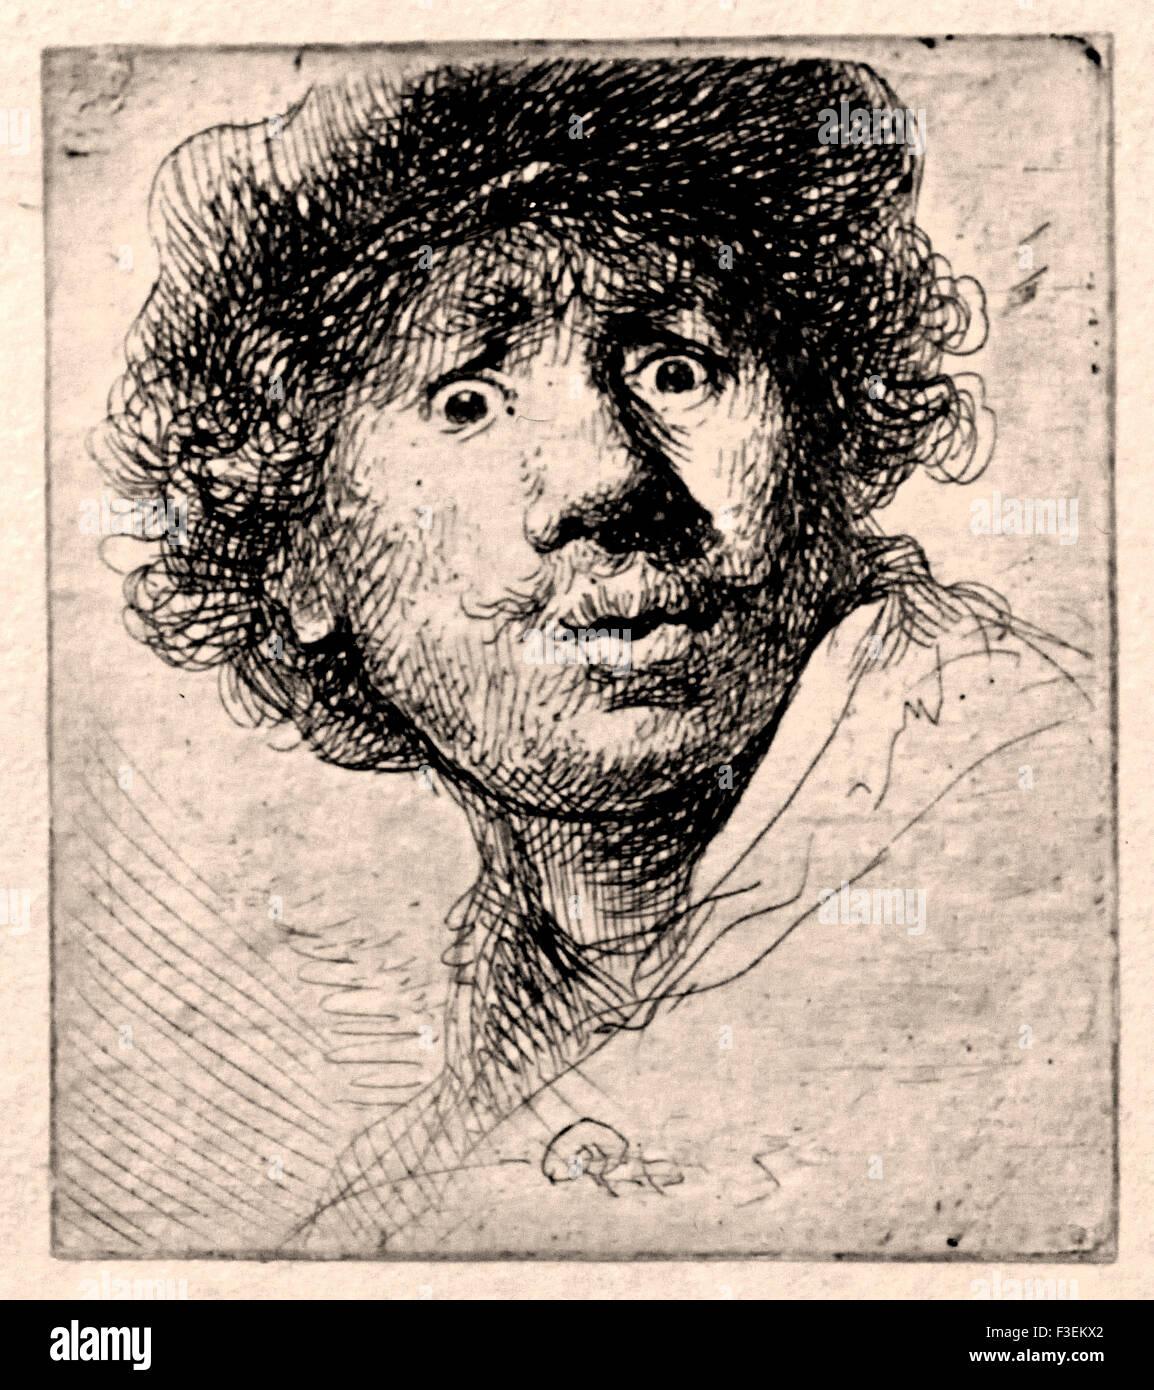 Self portrait open mouthed 1630 etch etching Rembrandt Harmenszoon van Rijn Dutch 1606–1669 Netherlands - Stock Image